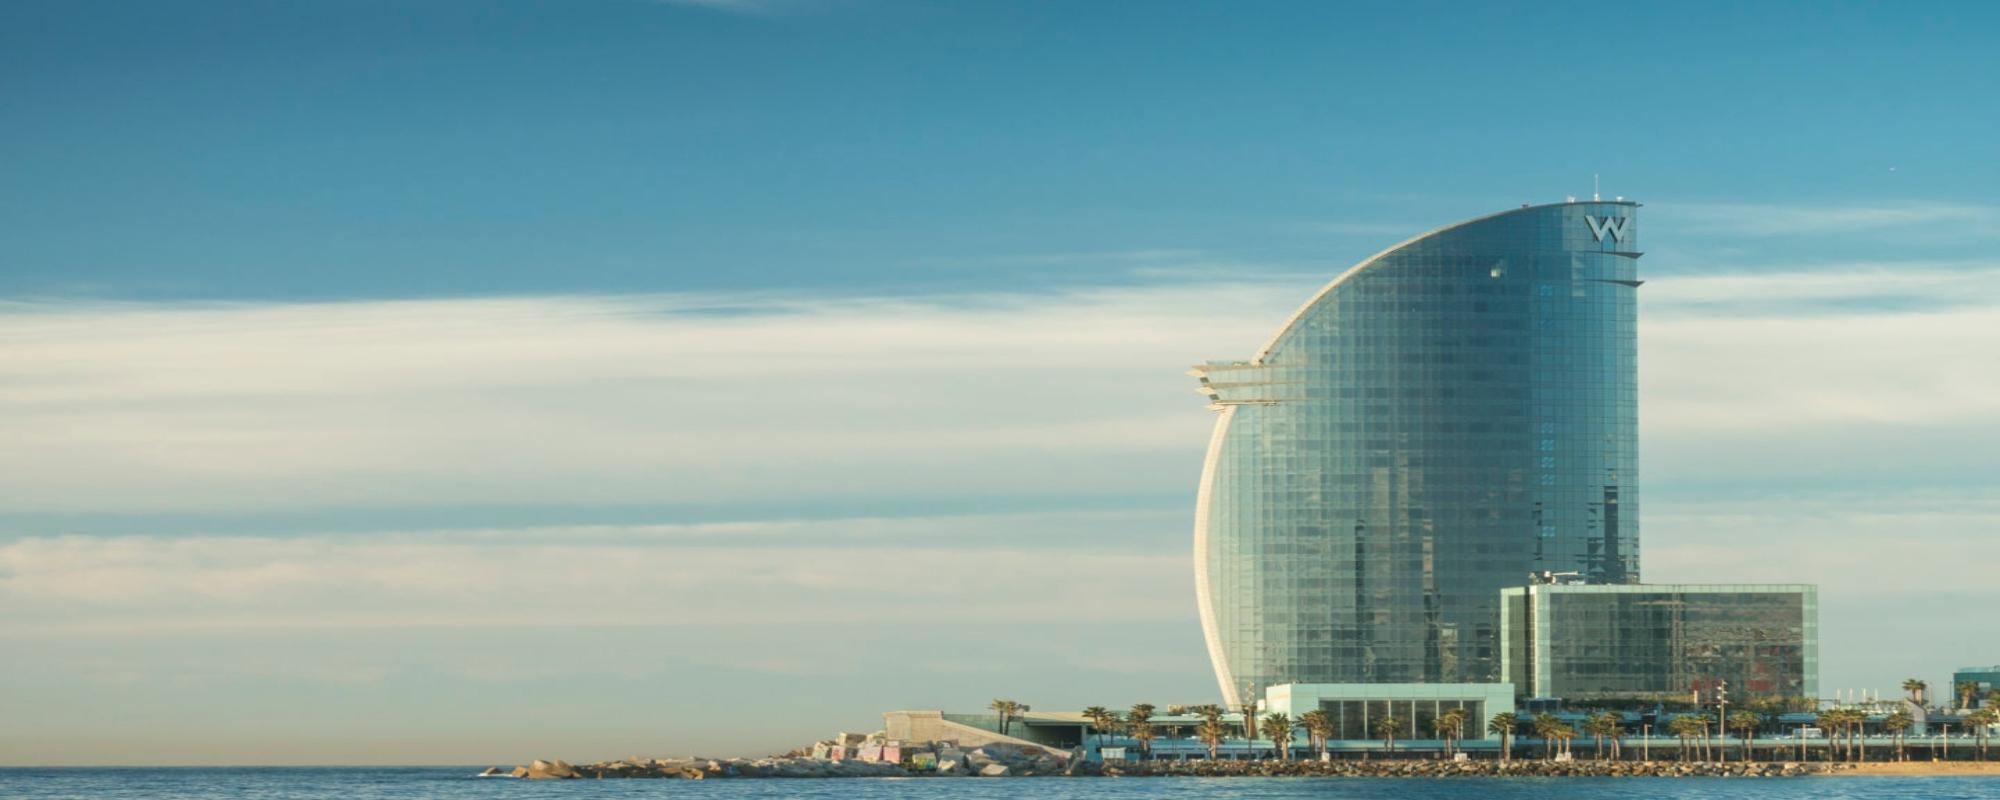 Estudio de Arquitectura: Ricardo Bofill crea proyectos lujuosos y poderosos estudio de arquitectura Estudio de Arquitectura: Ricardo Bofill crea proyectos lujuosos y poderosos Featured